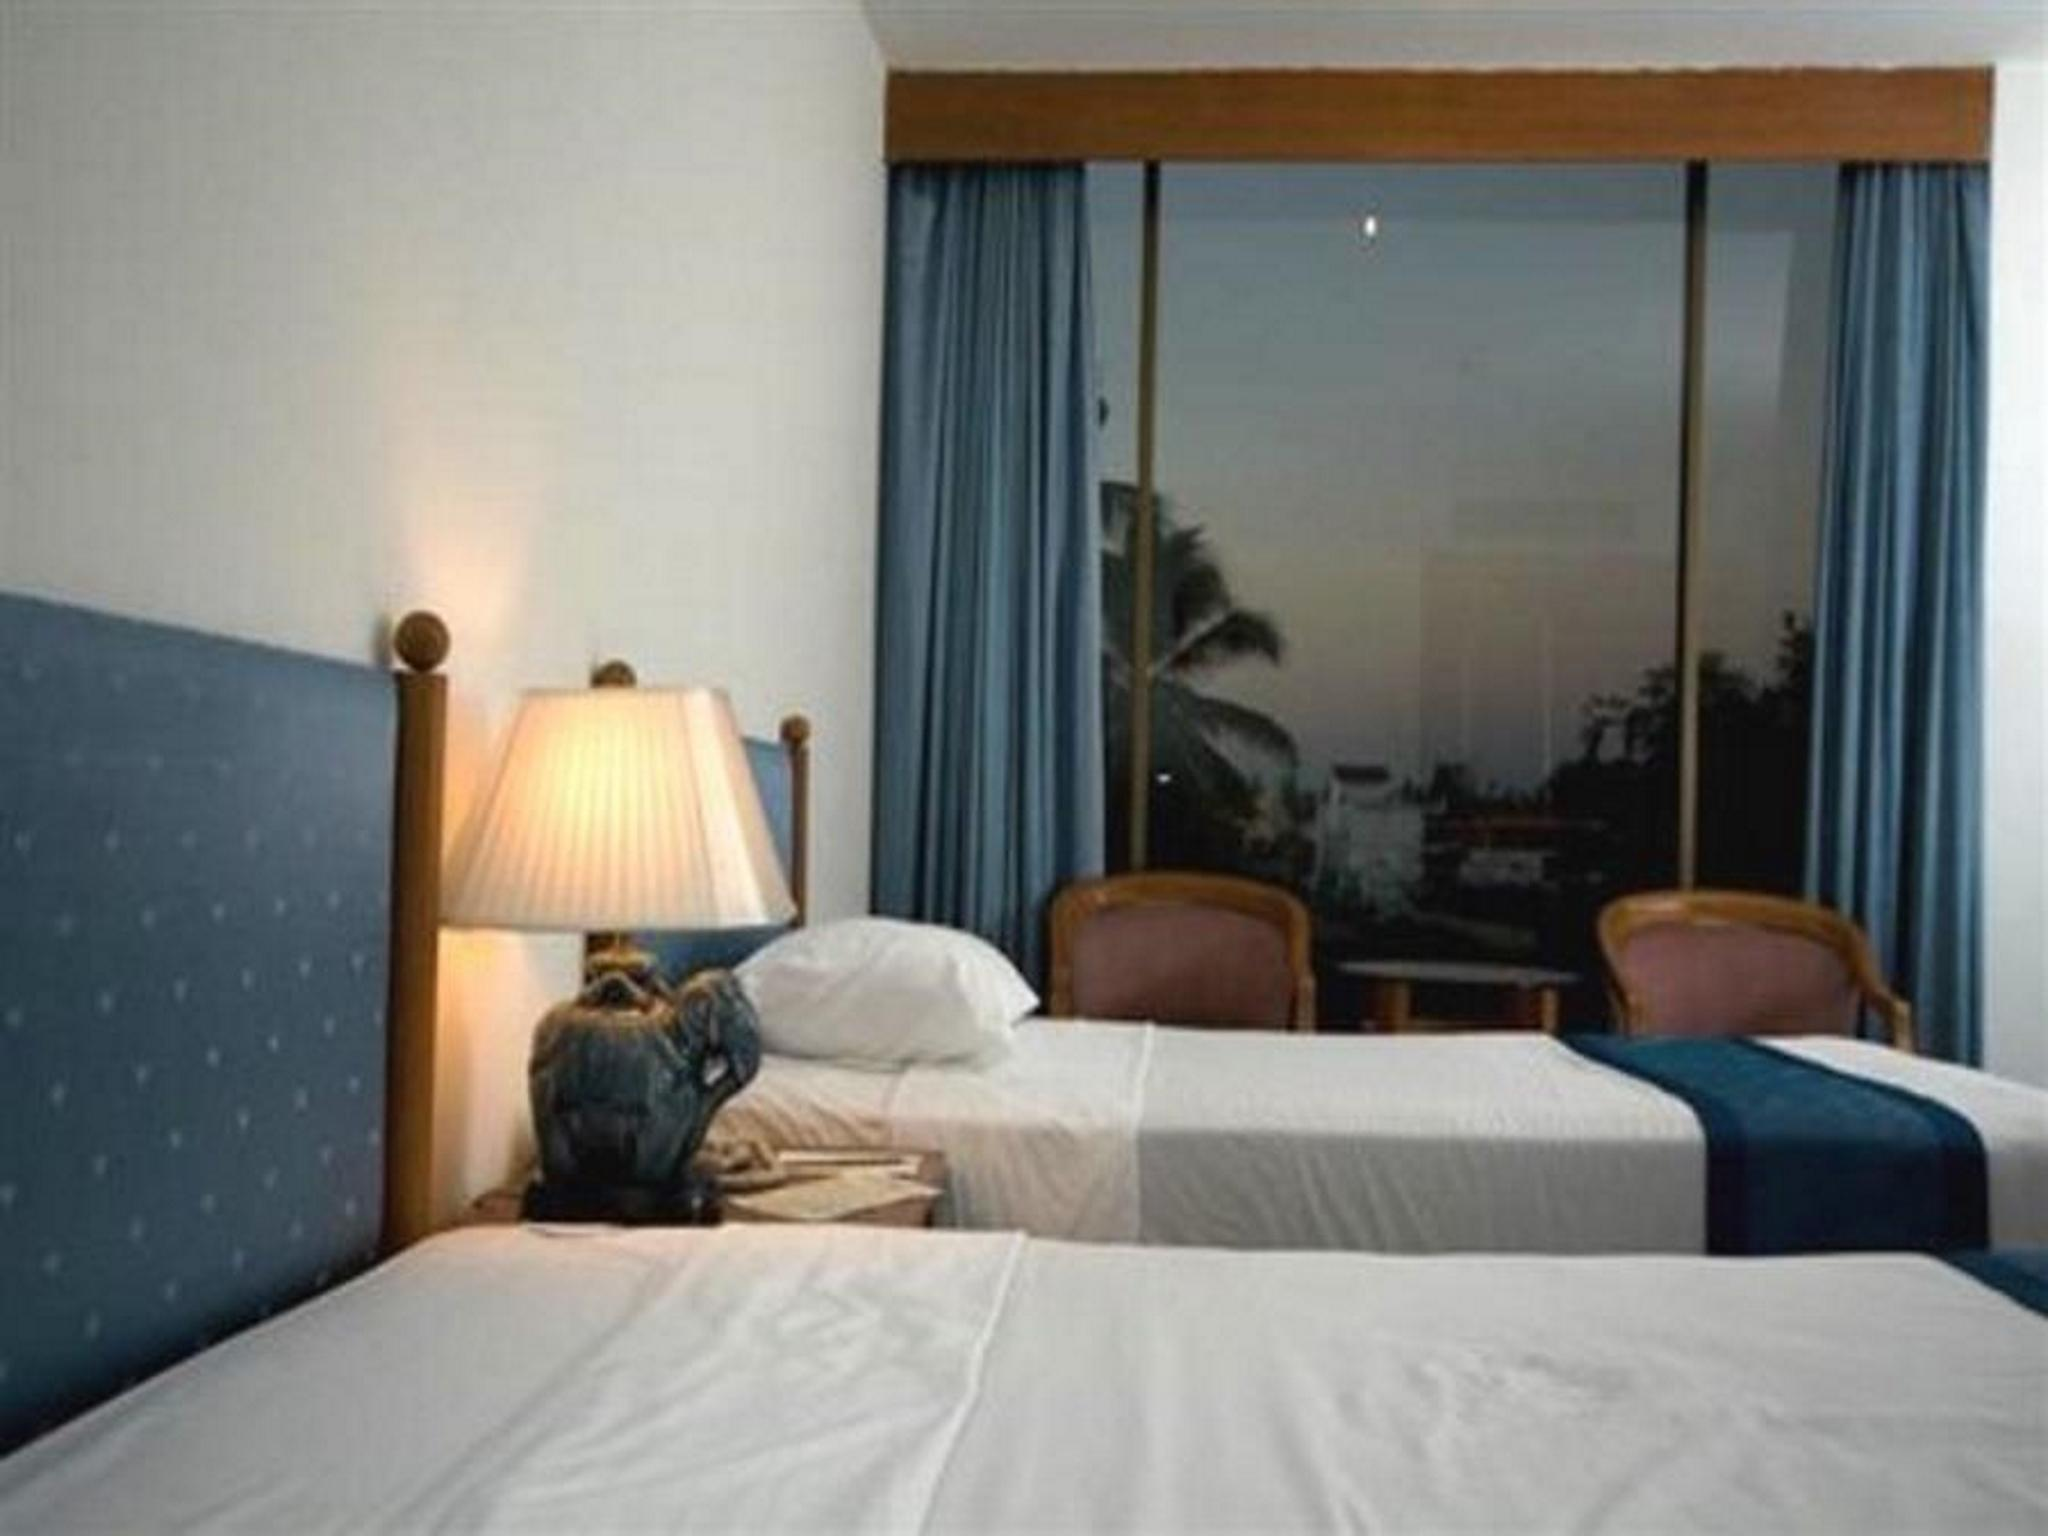 Tarin Hotel โรงแรมธาริน